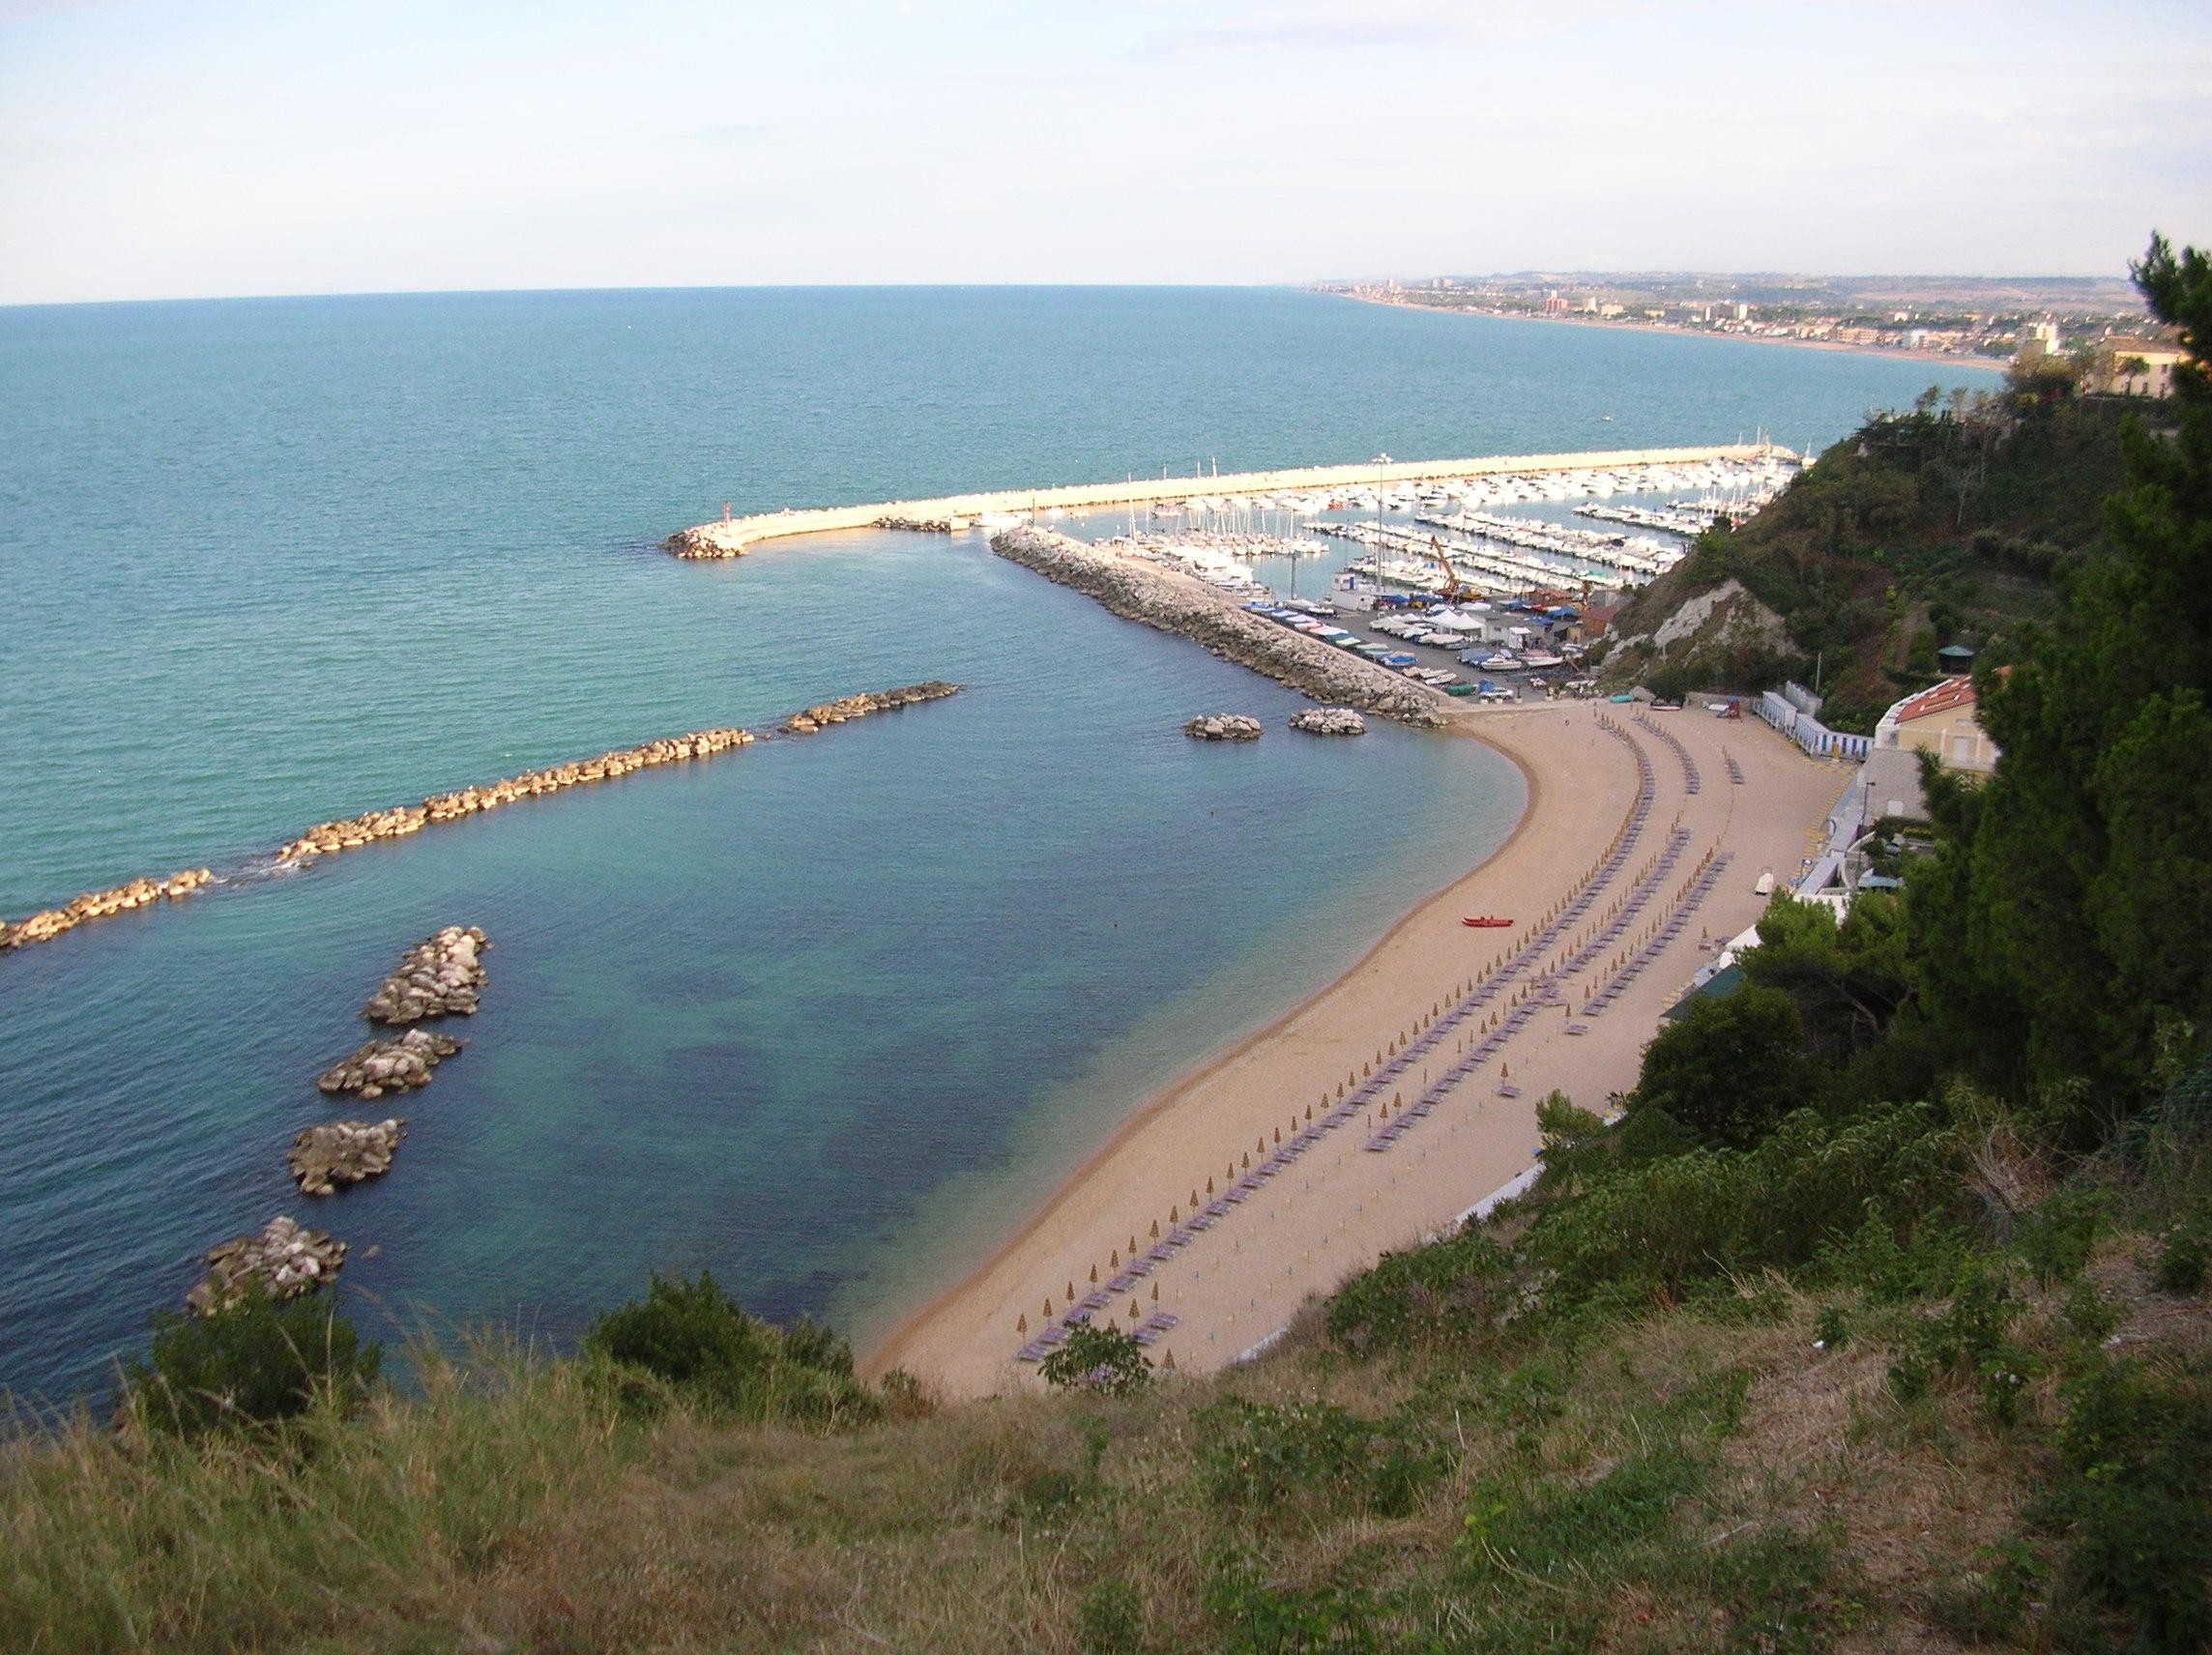 La Spiaggiola